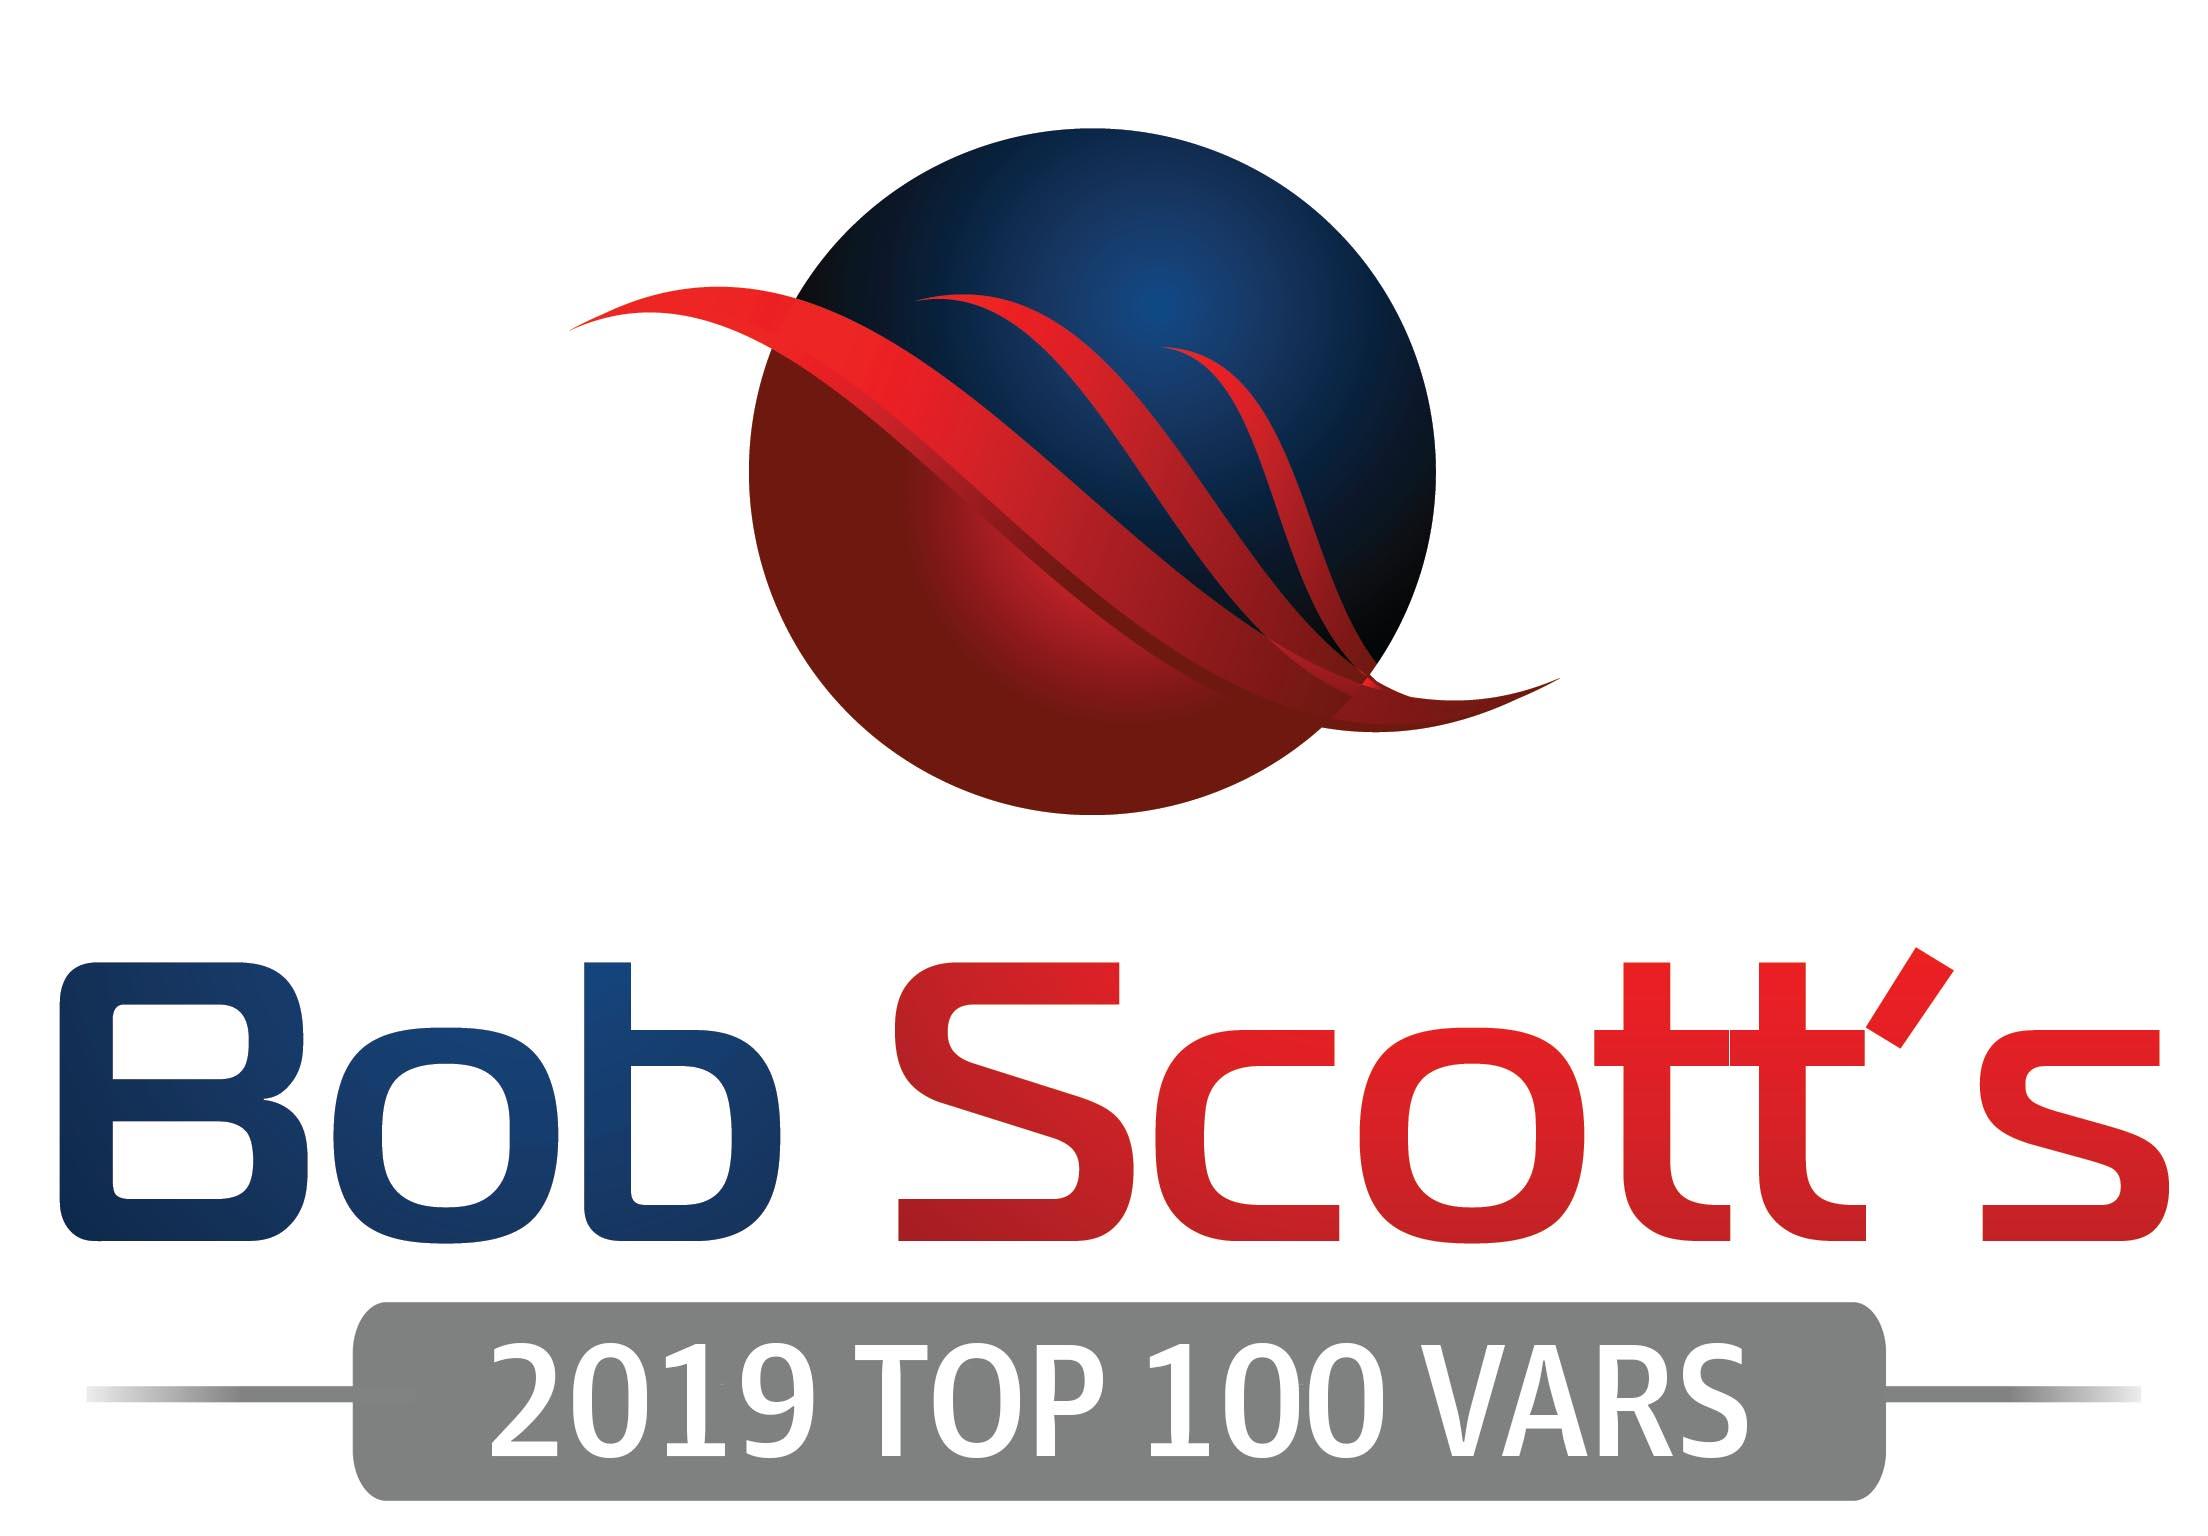 Press Release: Bob Scott's Top 100 VARs for 2019